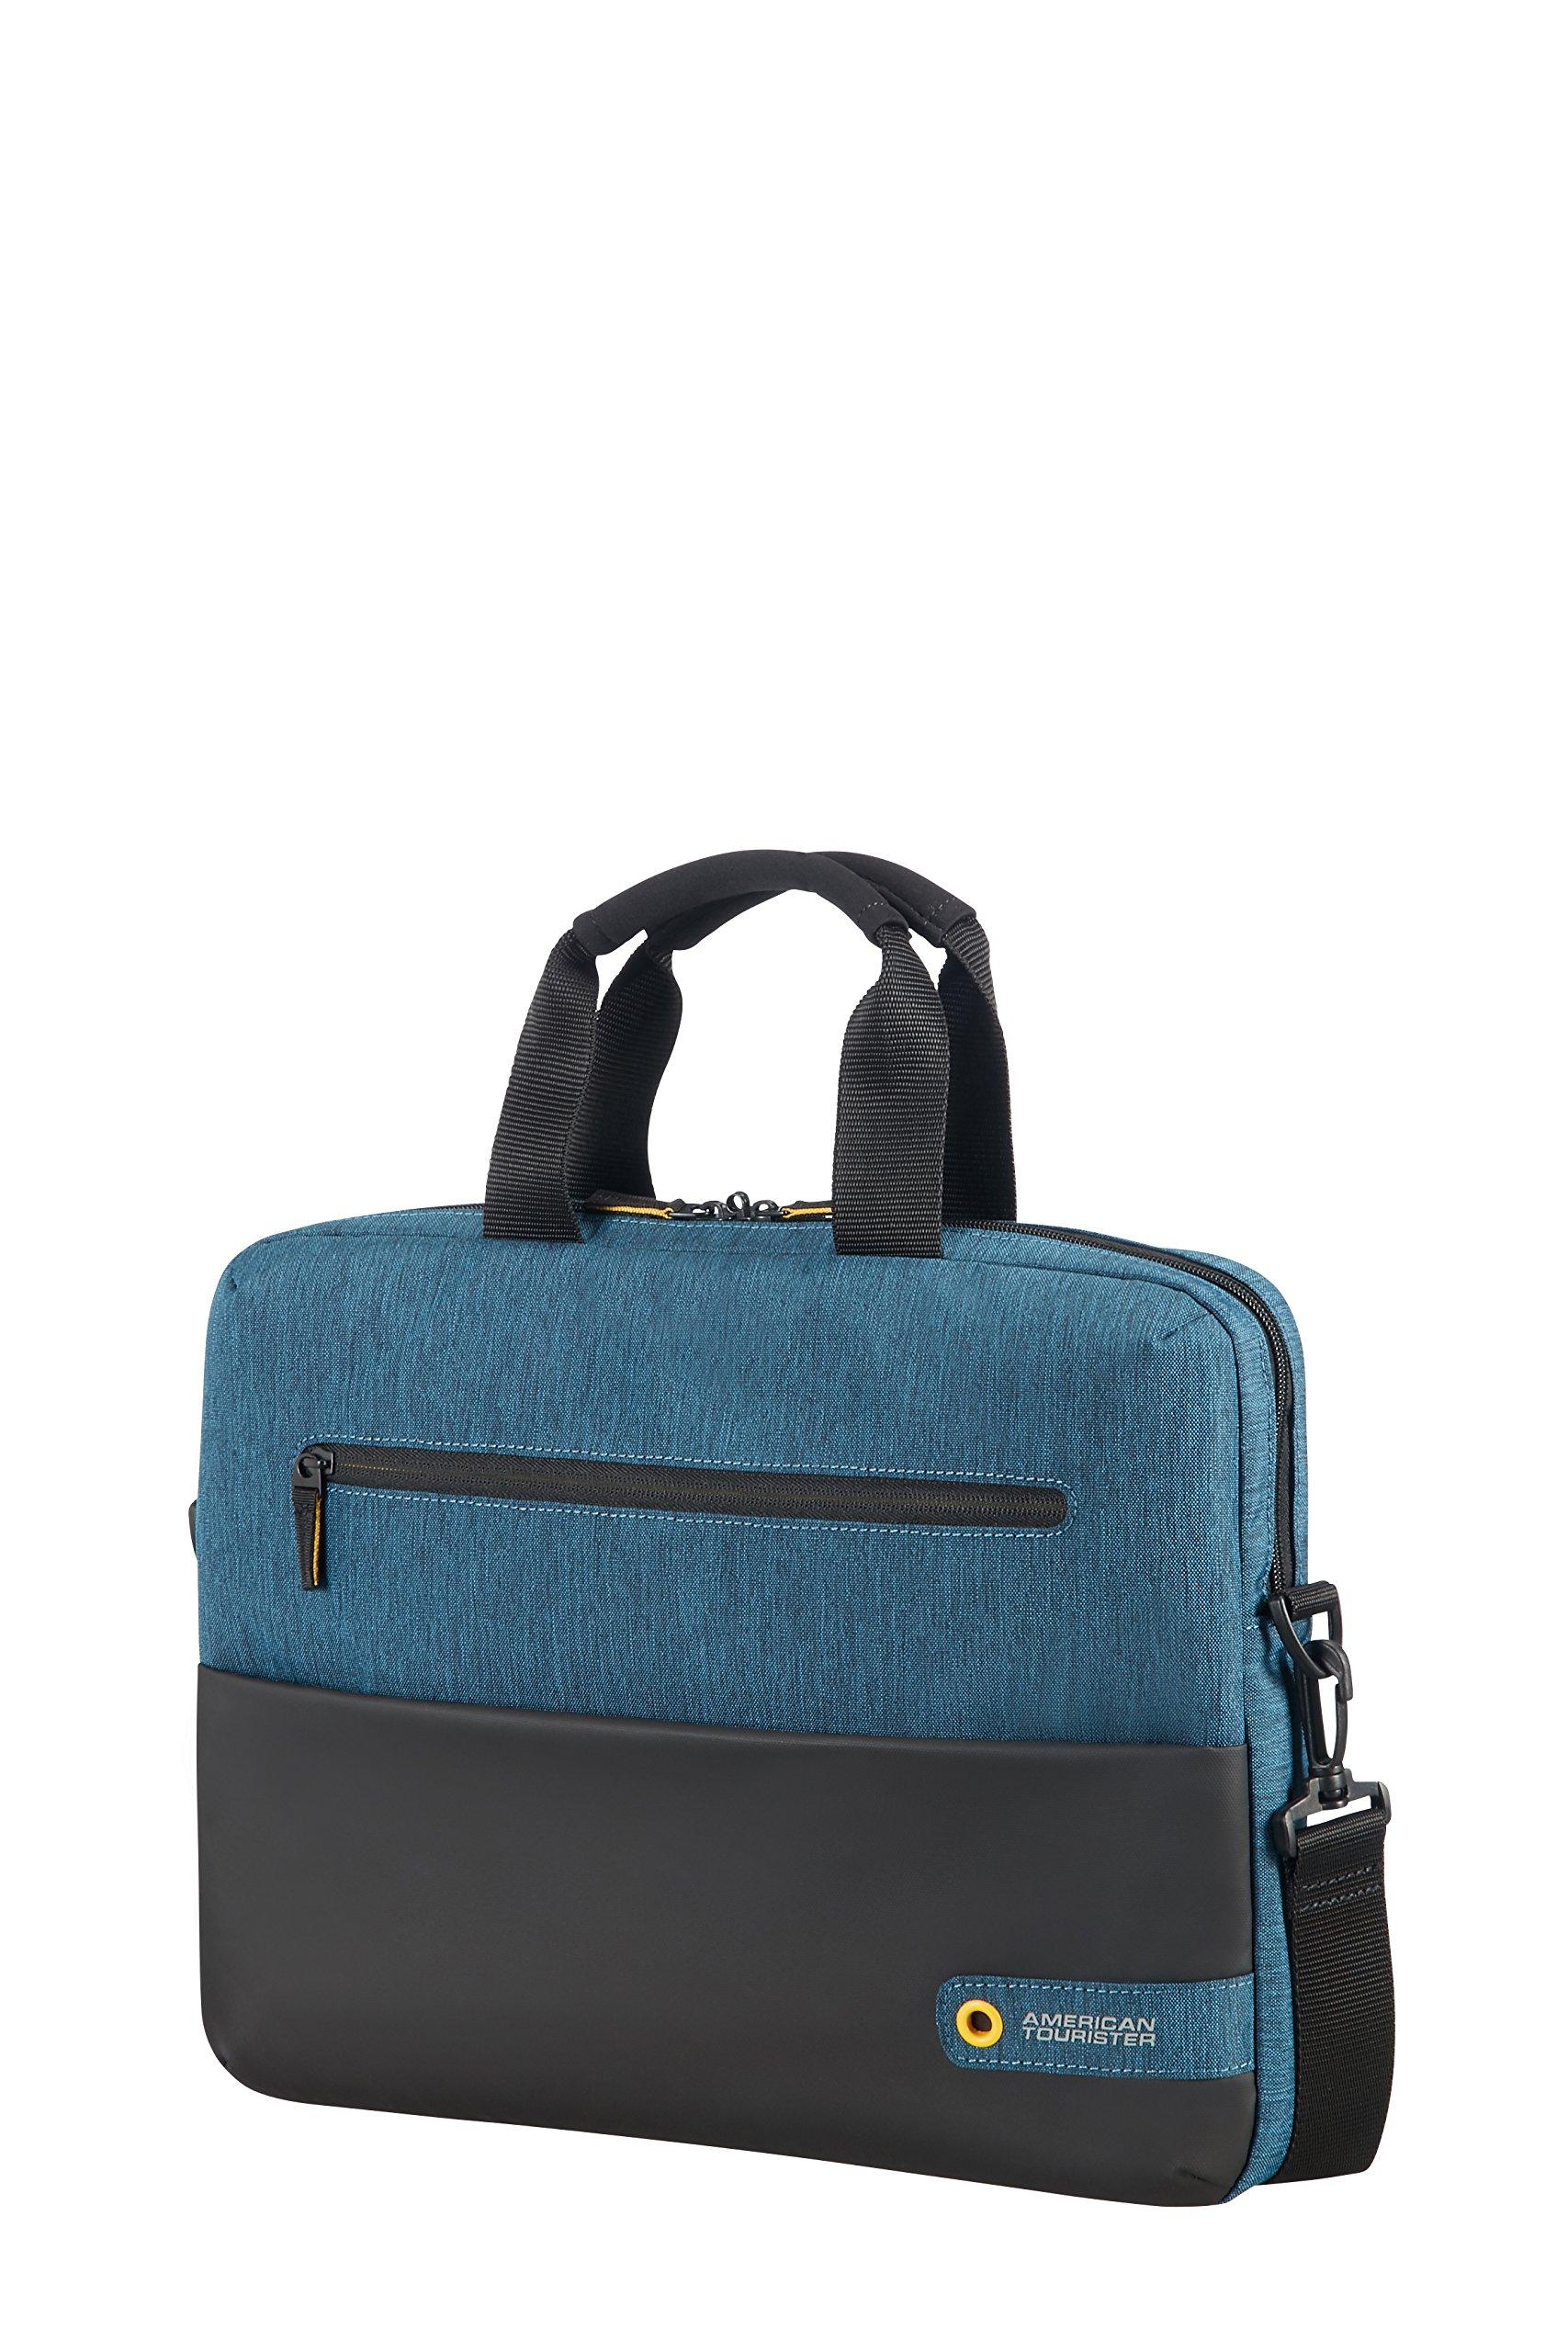 American Tourister City Drift Laptop Bag Portable Handbag Hanger, 41 cm, 10 Liters, Black/Blue